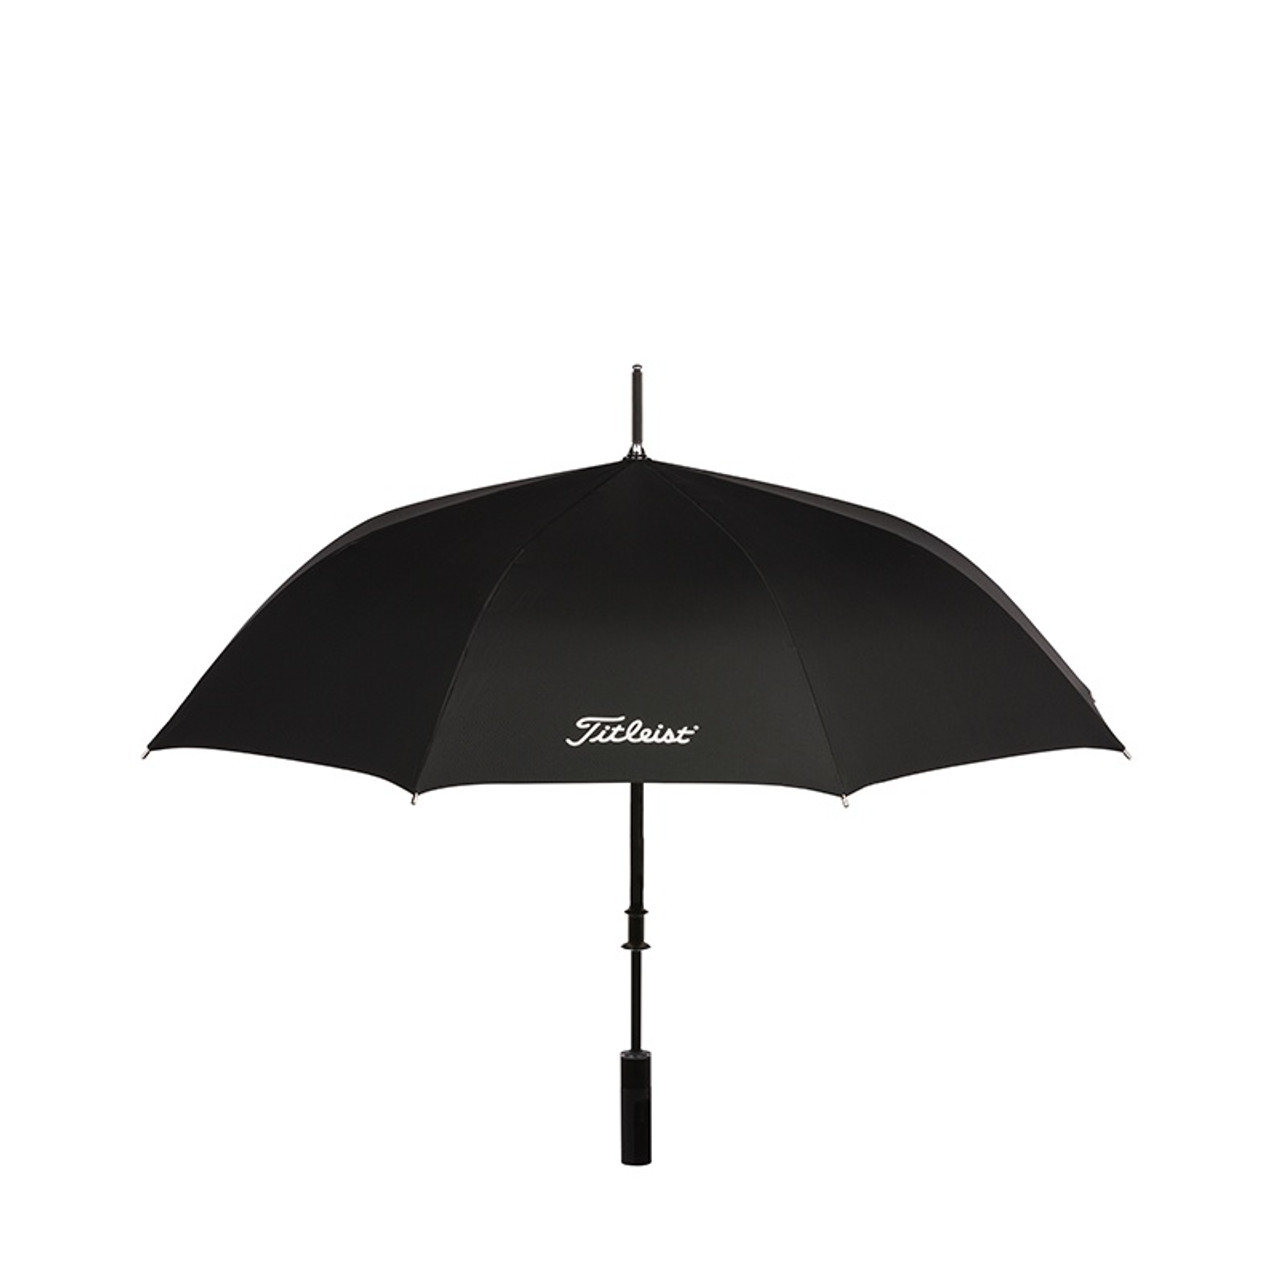 Titleist Professional Collection Single Canopy Umbrella